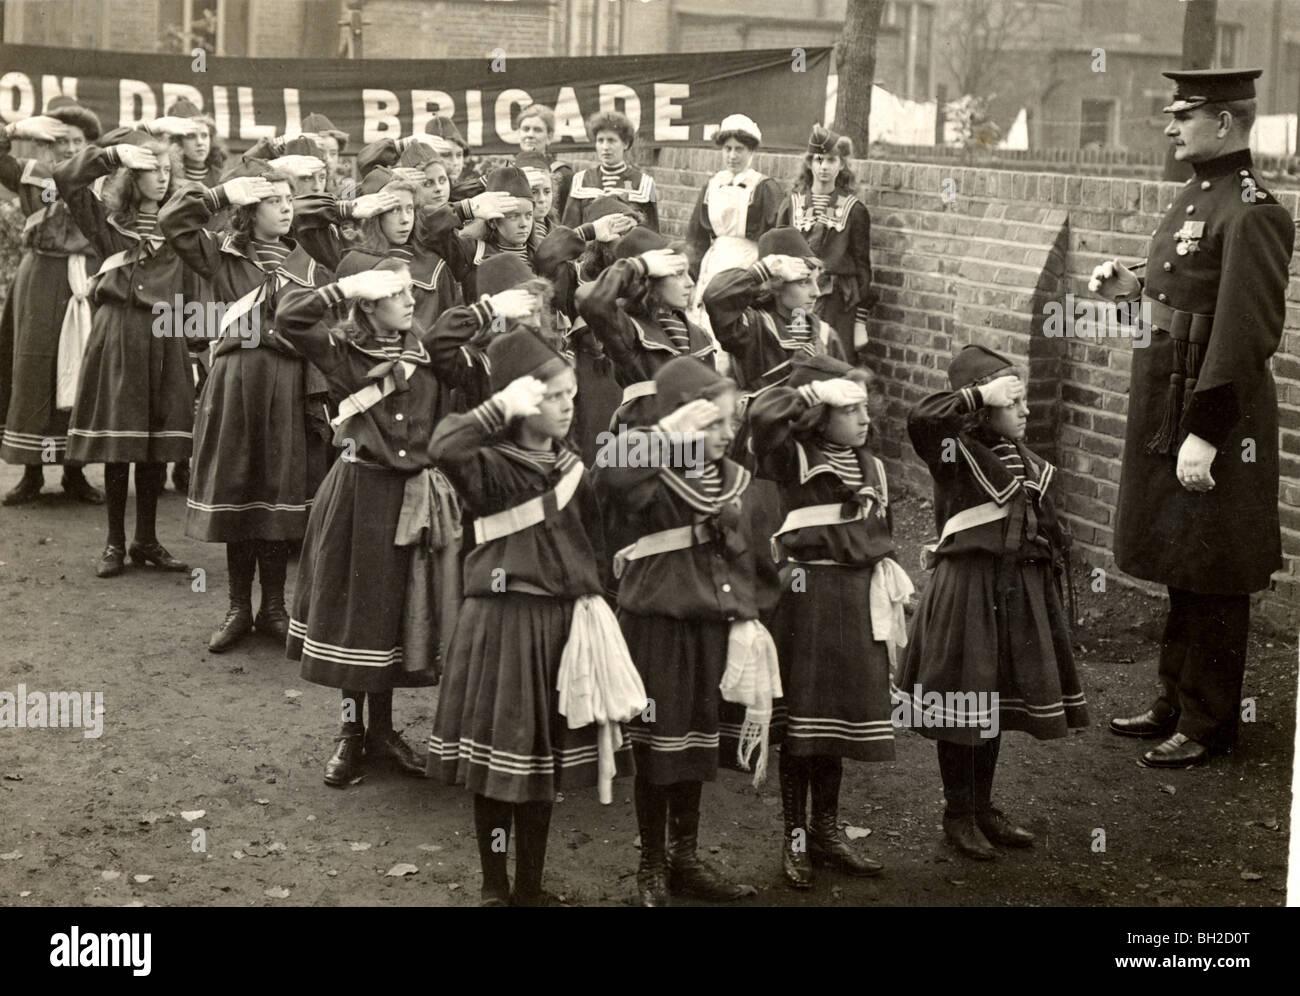 Girls Drill Brigade Saluting Commanding Officer - Stock Image